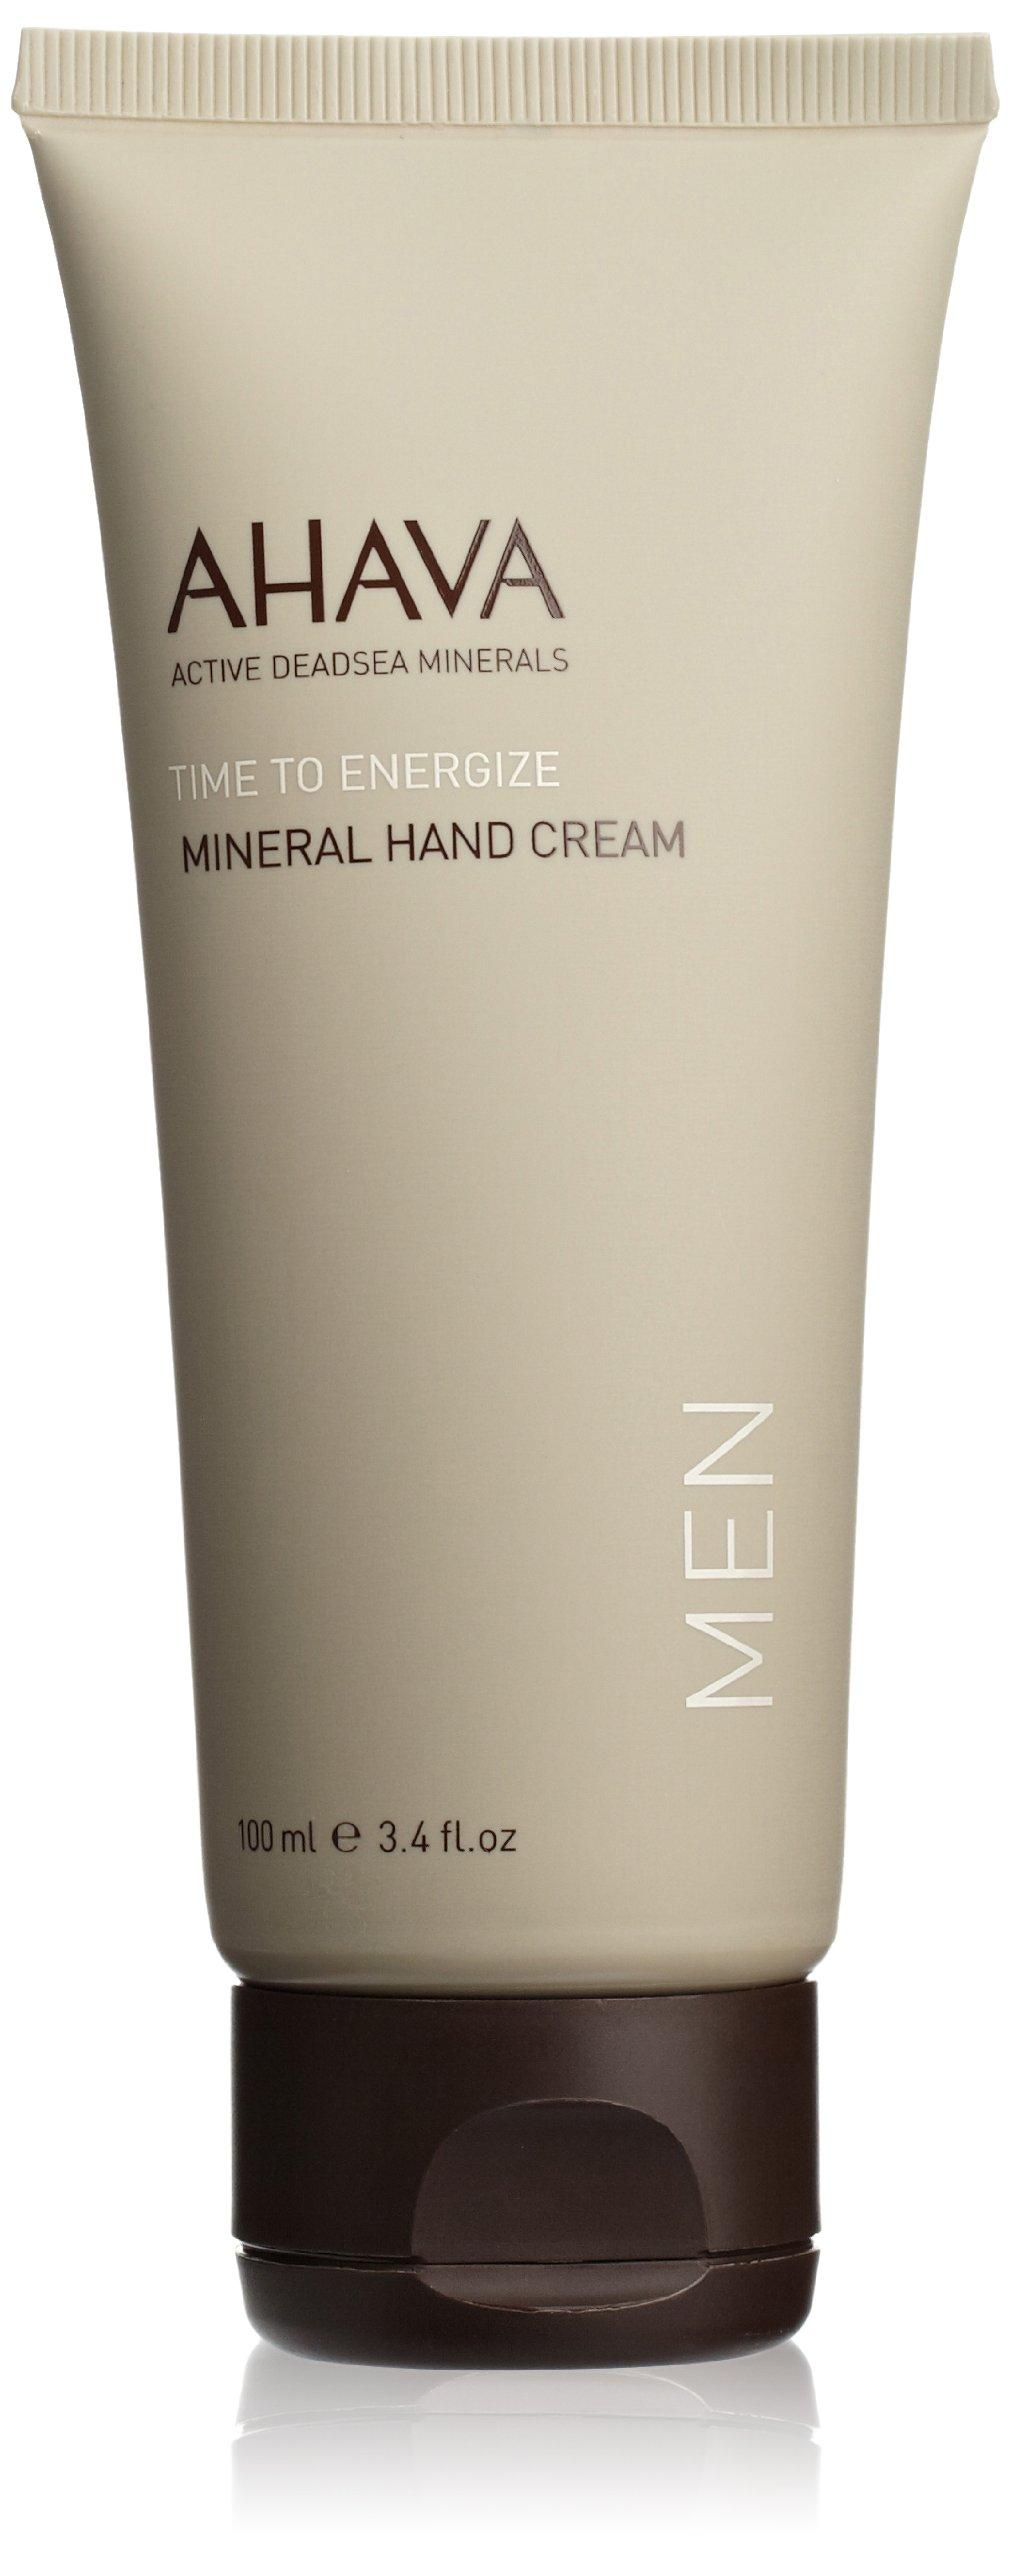 AHAVA Time to Energize Mineral Hand Cream for Men, 3.4 fl. oz.